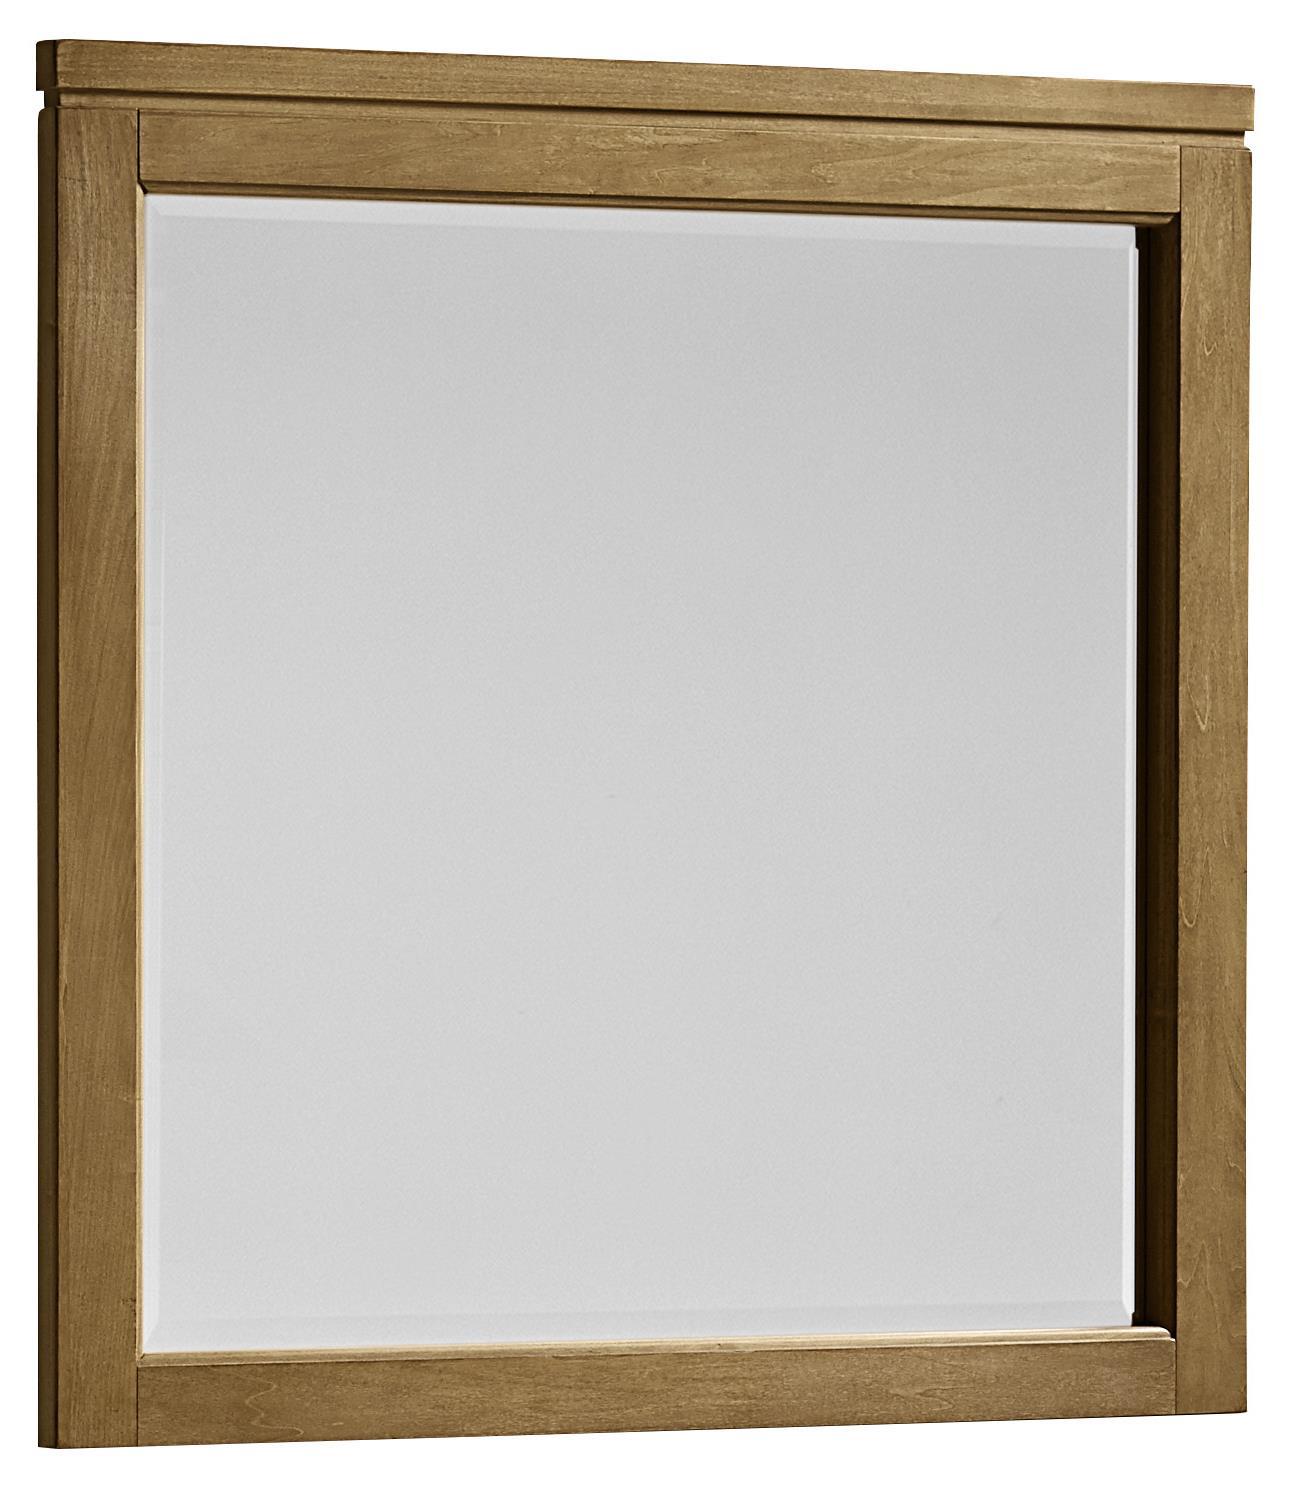 Vaughan Bassett Kismet Landscape Mirror - Item Number: 414-446